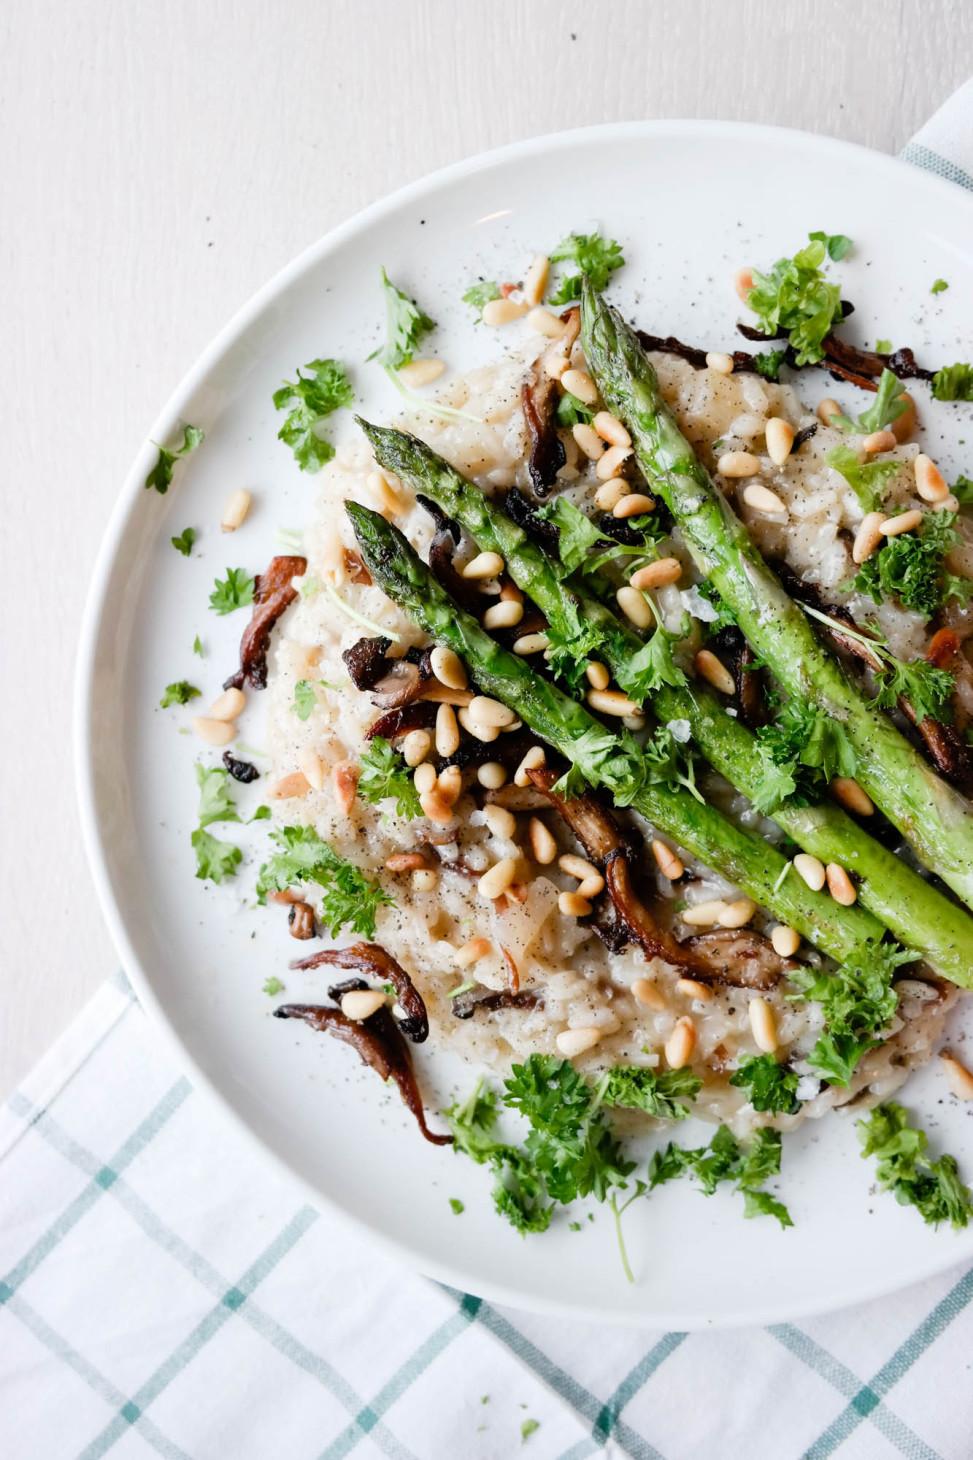 Vegansk risotto med hjemmelaget kraft, østerssopp, asparges og pinjekjerner er den ultimate søndagsmiddagen!